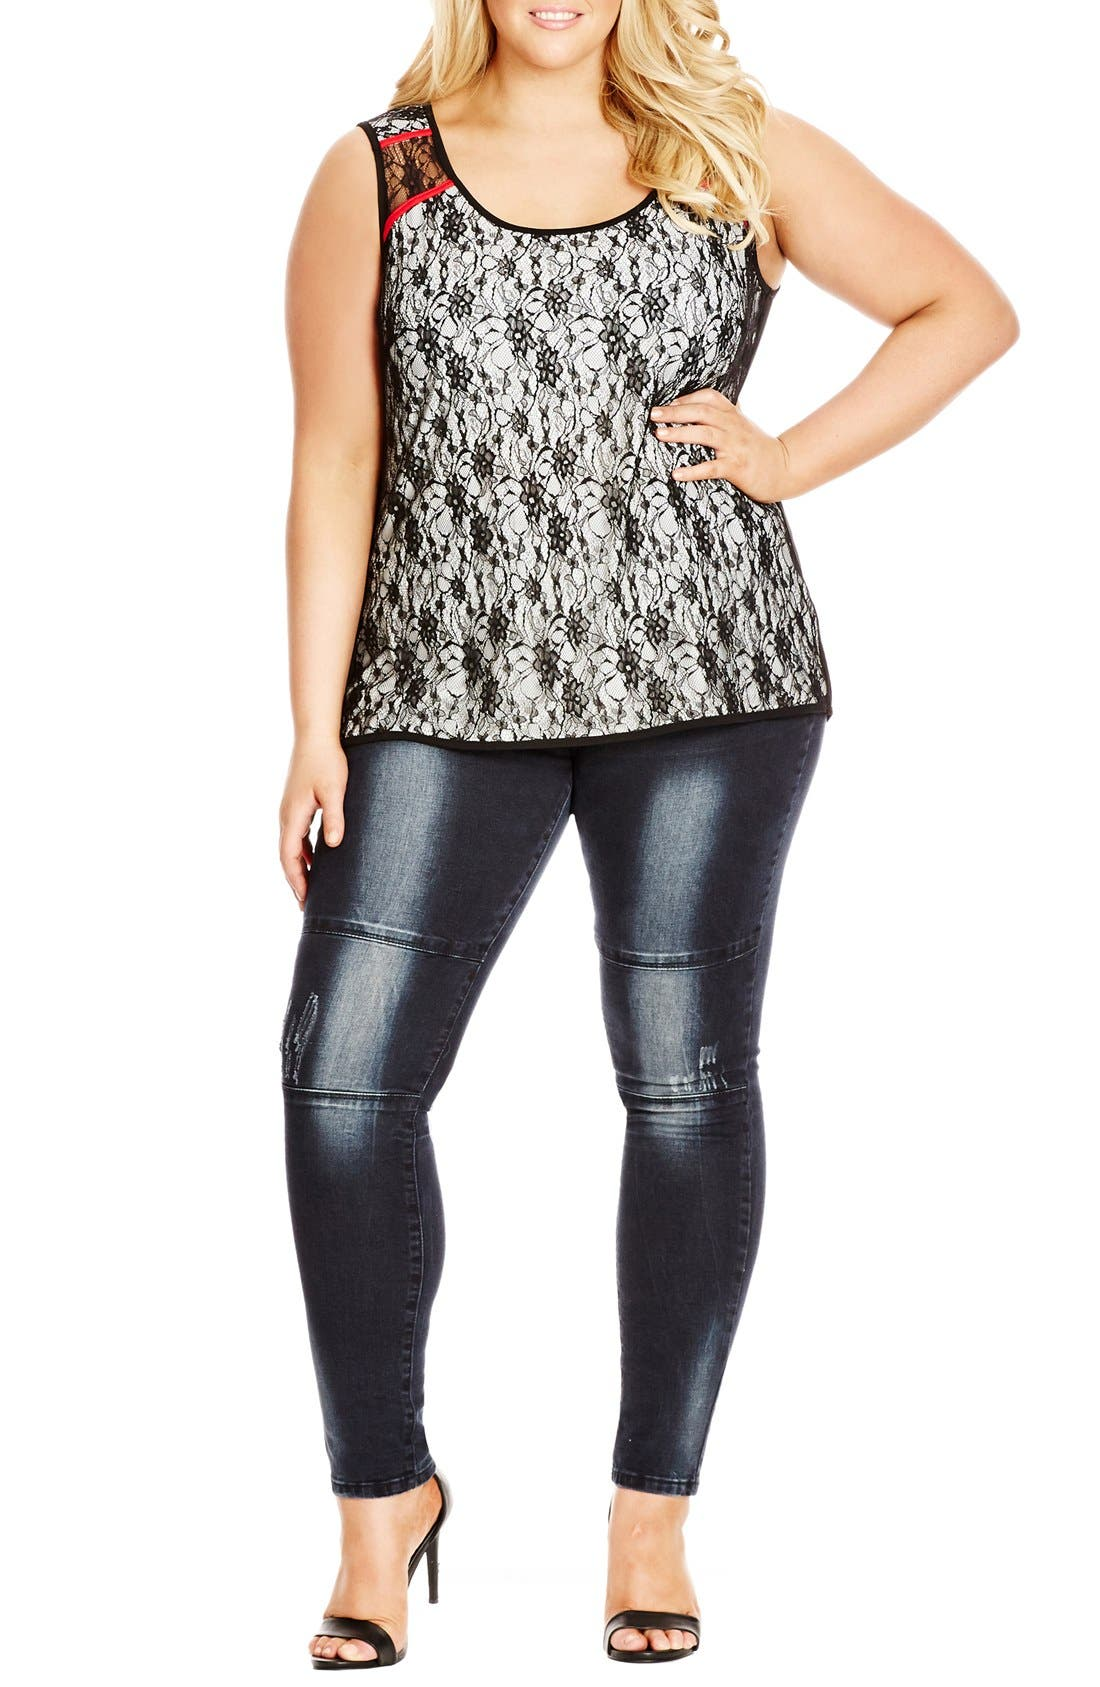 Main Image - City Chic Lace Overlay Sleeveless Top (Plus Size)